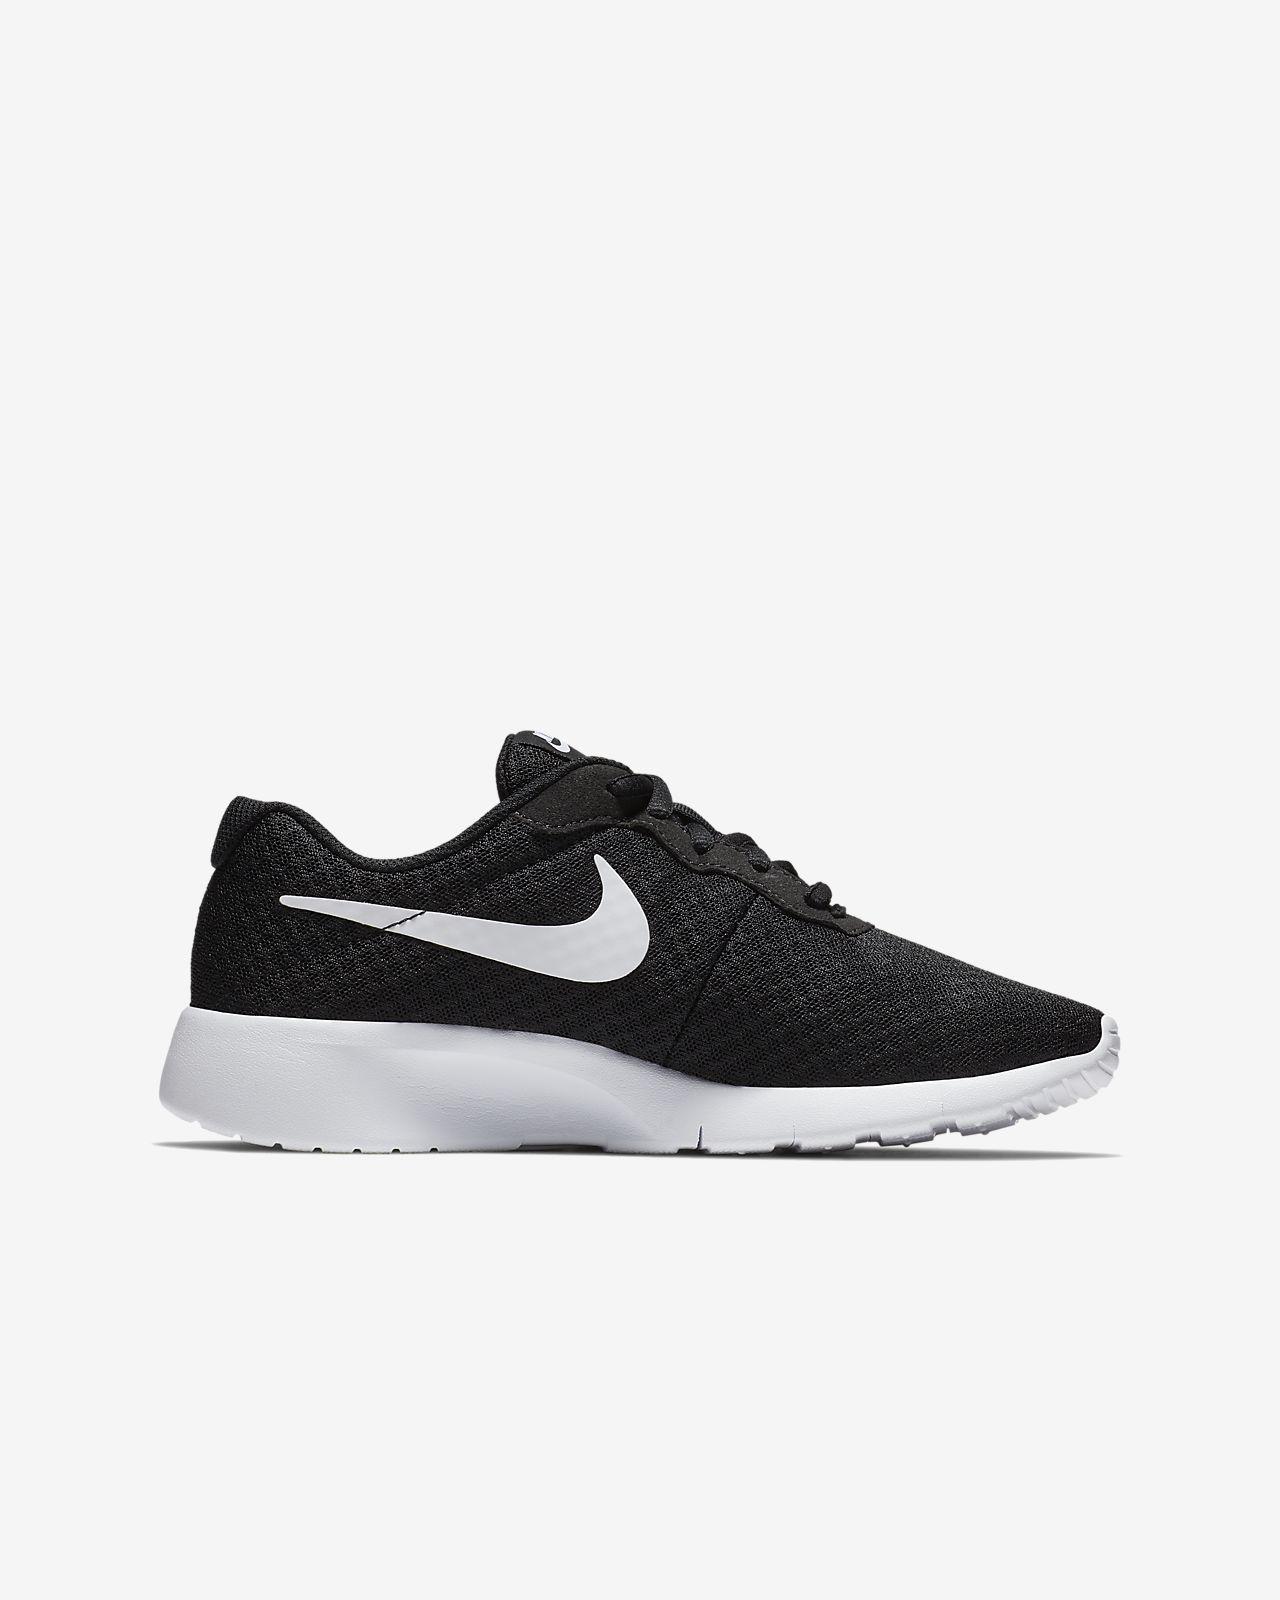 520505e64e Nike Tanjun Big Kids' Shoe (Wide). Nike.com